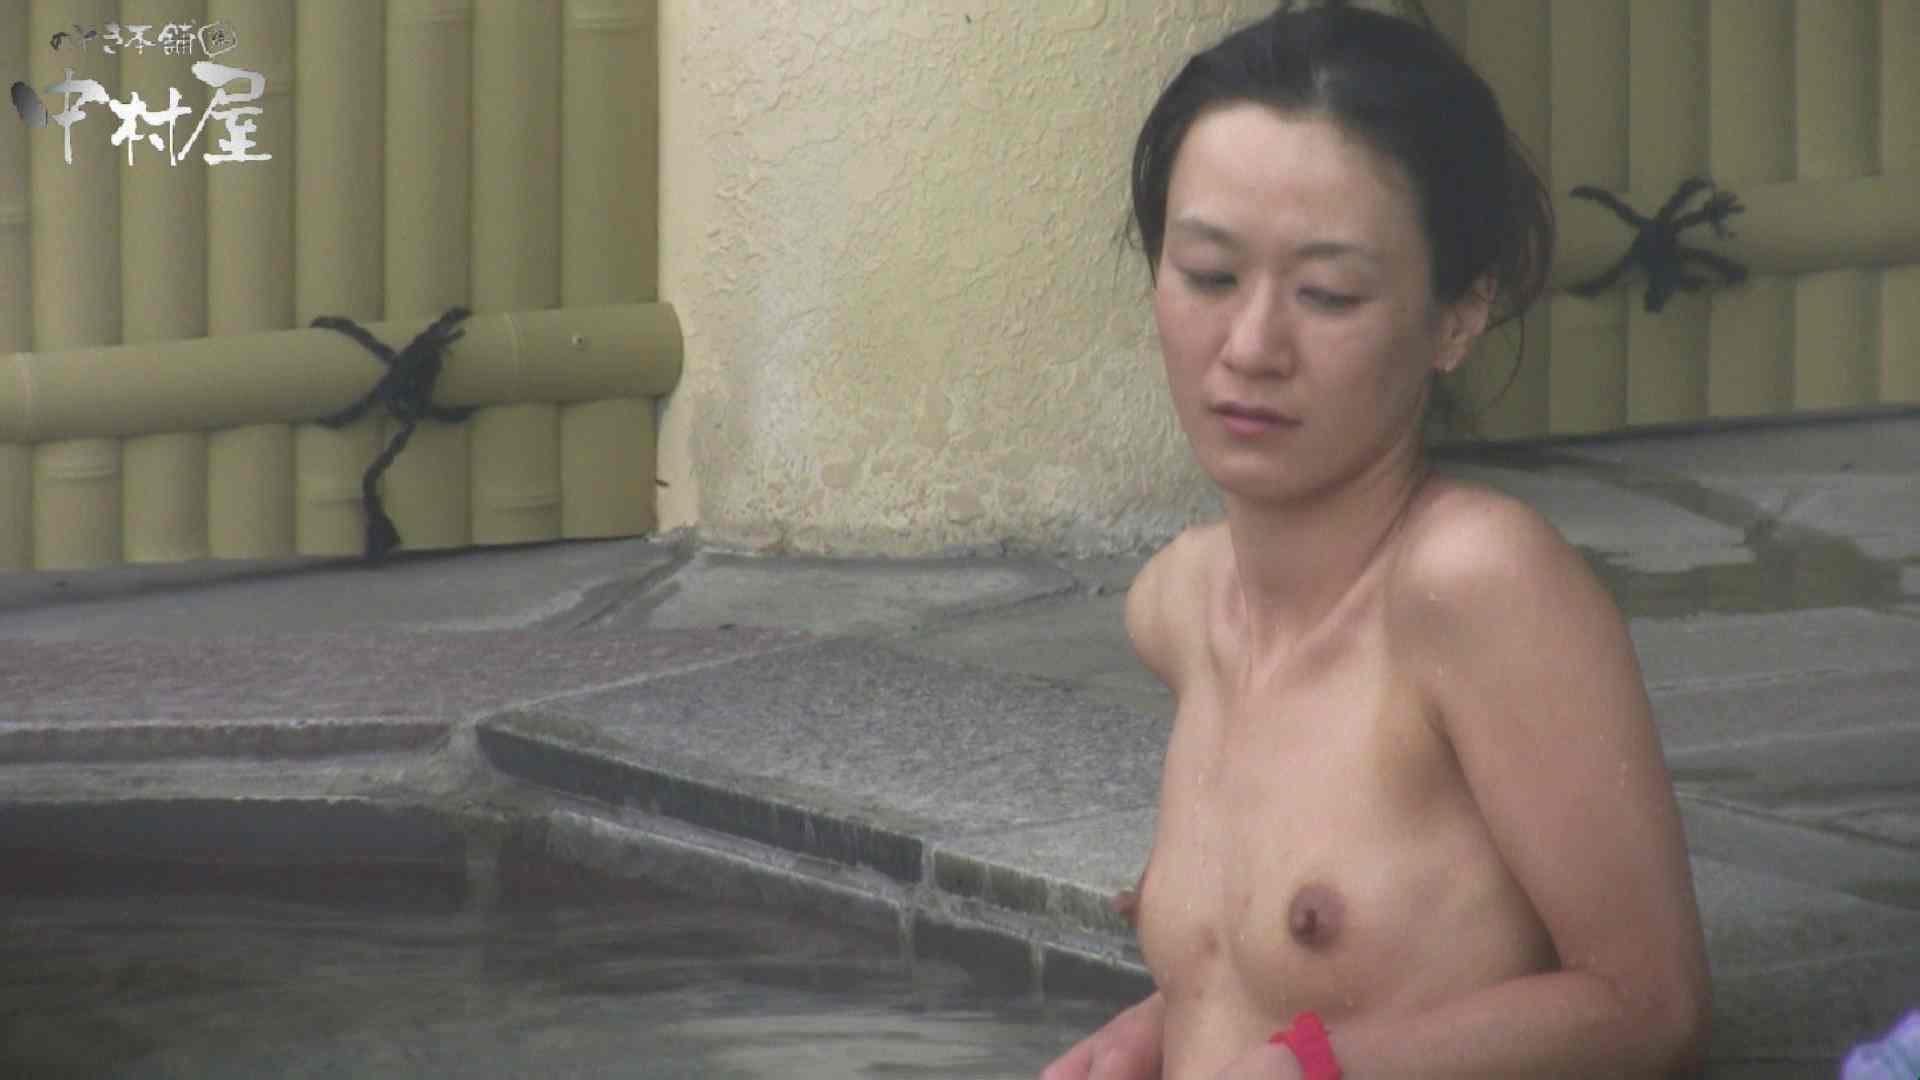 Aquaな露天風呂Vol.928 OLセックス | 盗撮  99画像 61